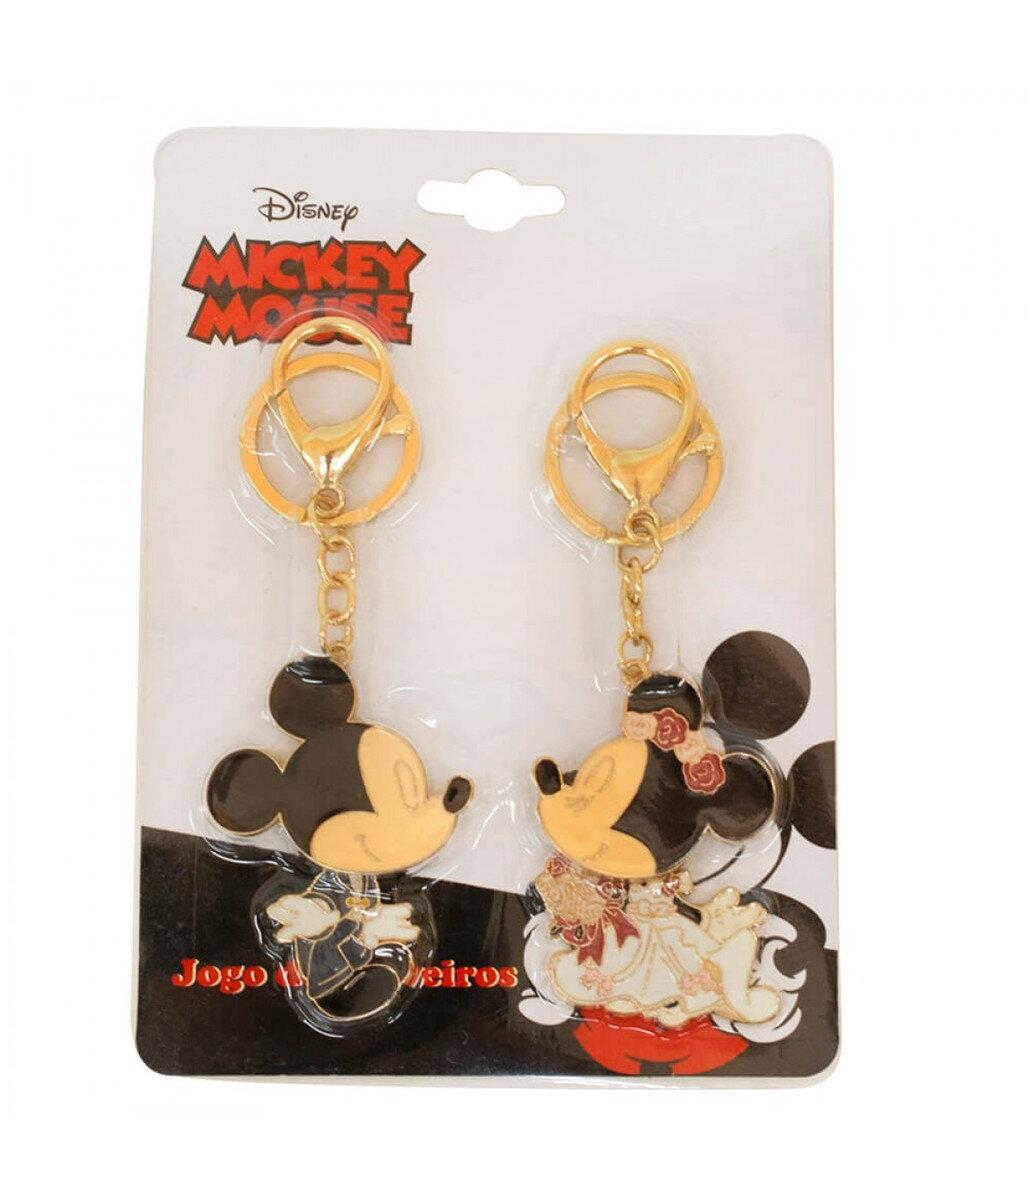 Jogo de Chaveiros Noivos Mickey & Minnie: Mickey e Minnie Mouse - Disney